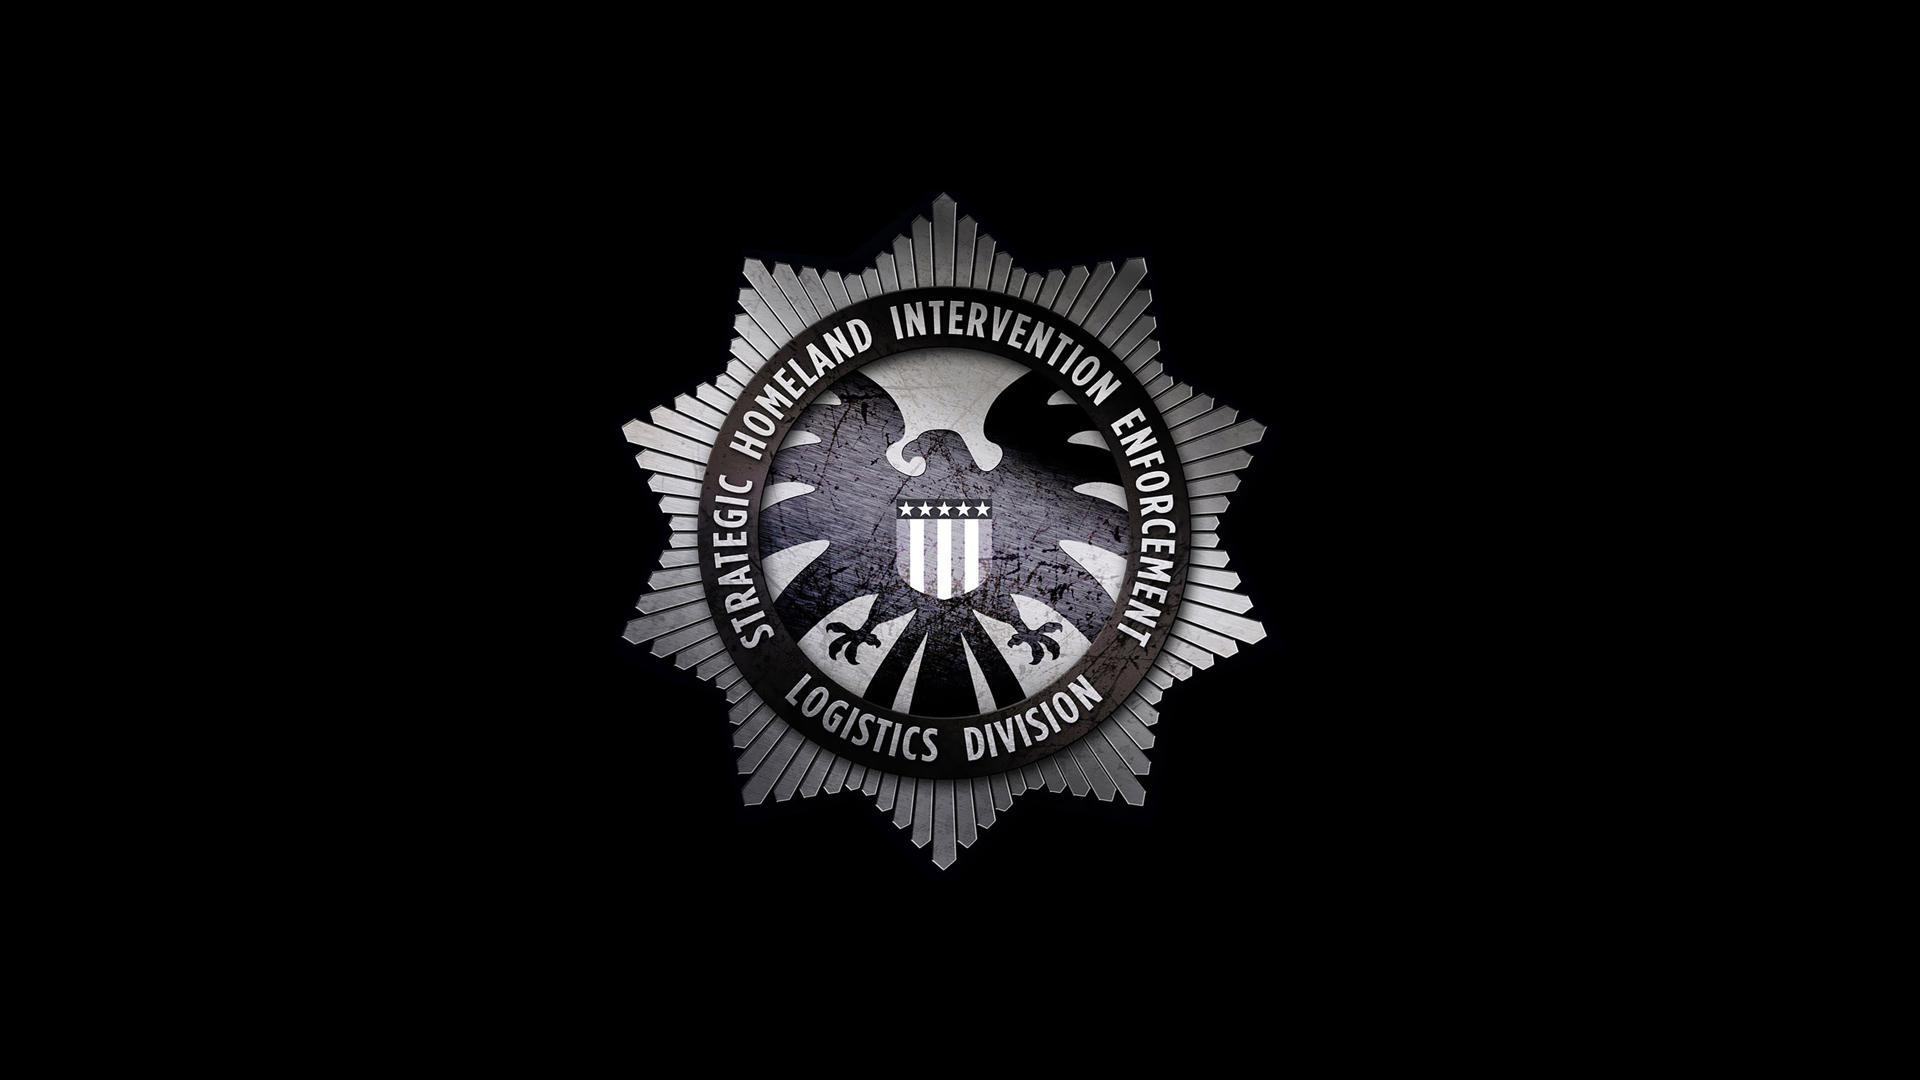 Agents of SHIELD Wallpaper 1920x1080 1920x1080